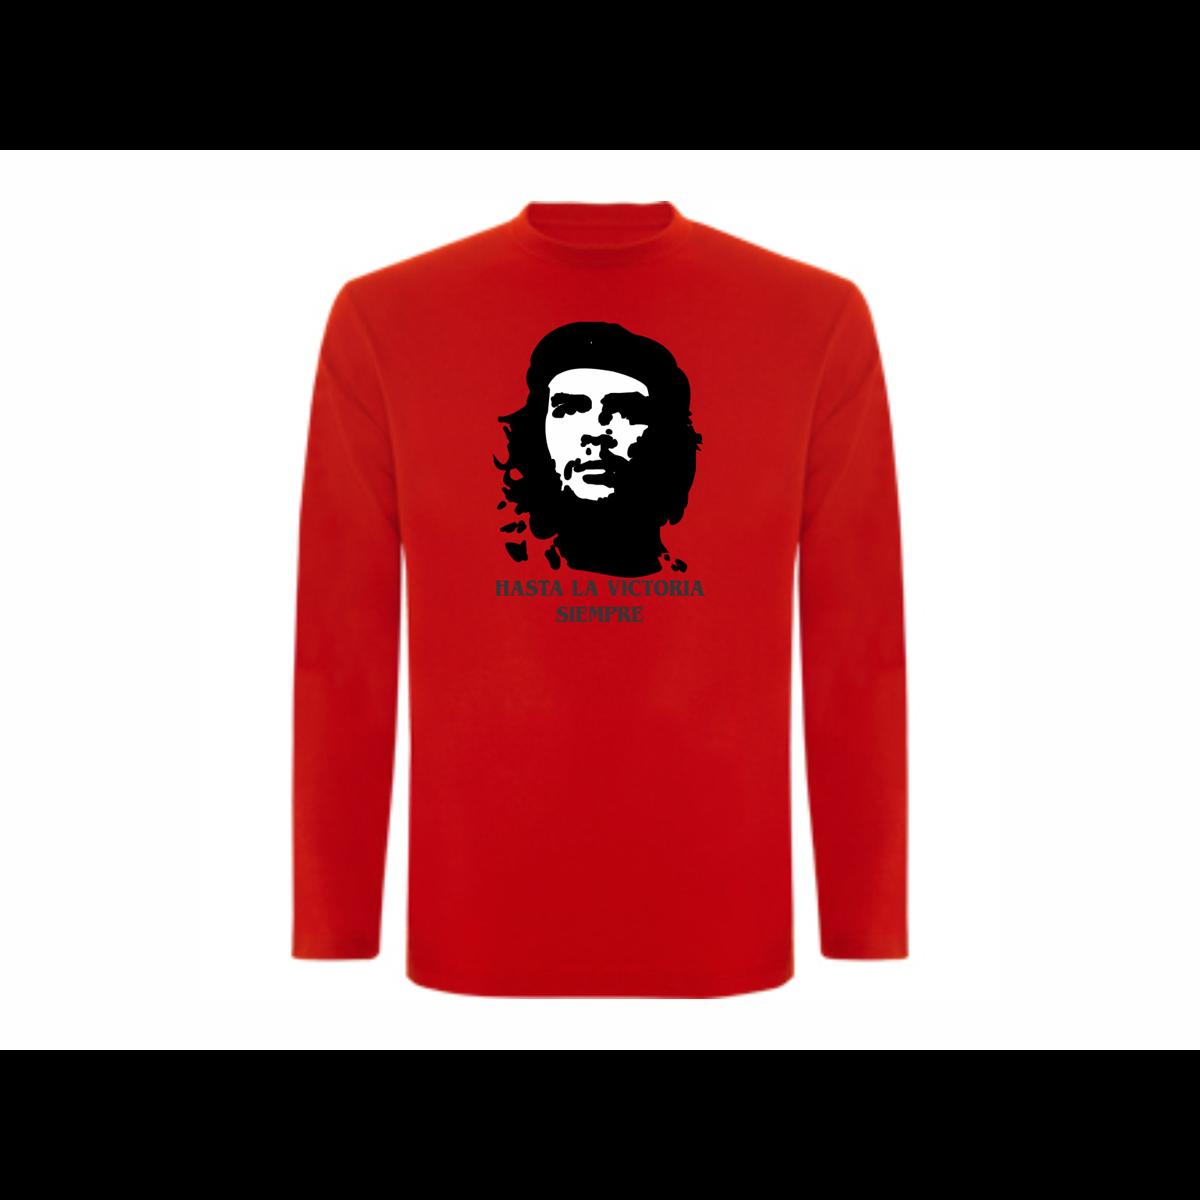 T shirt ls che guevara for Che guevara t shirt